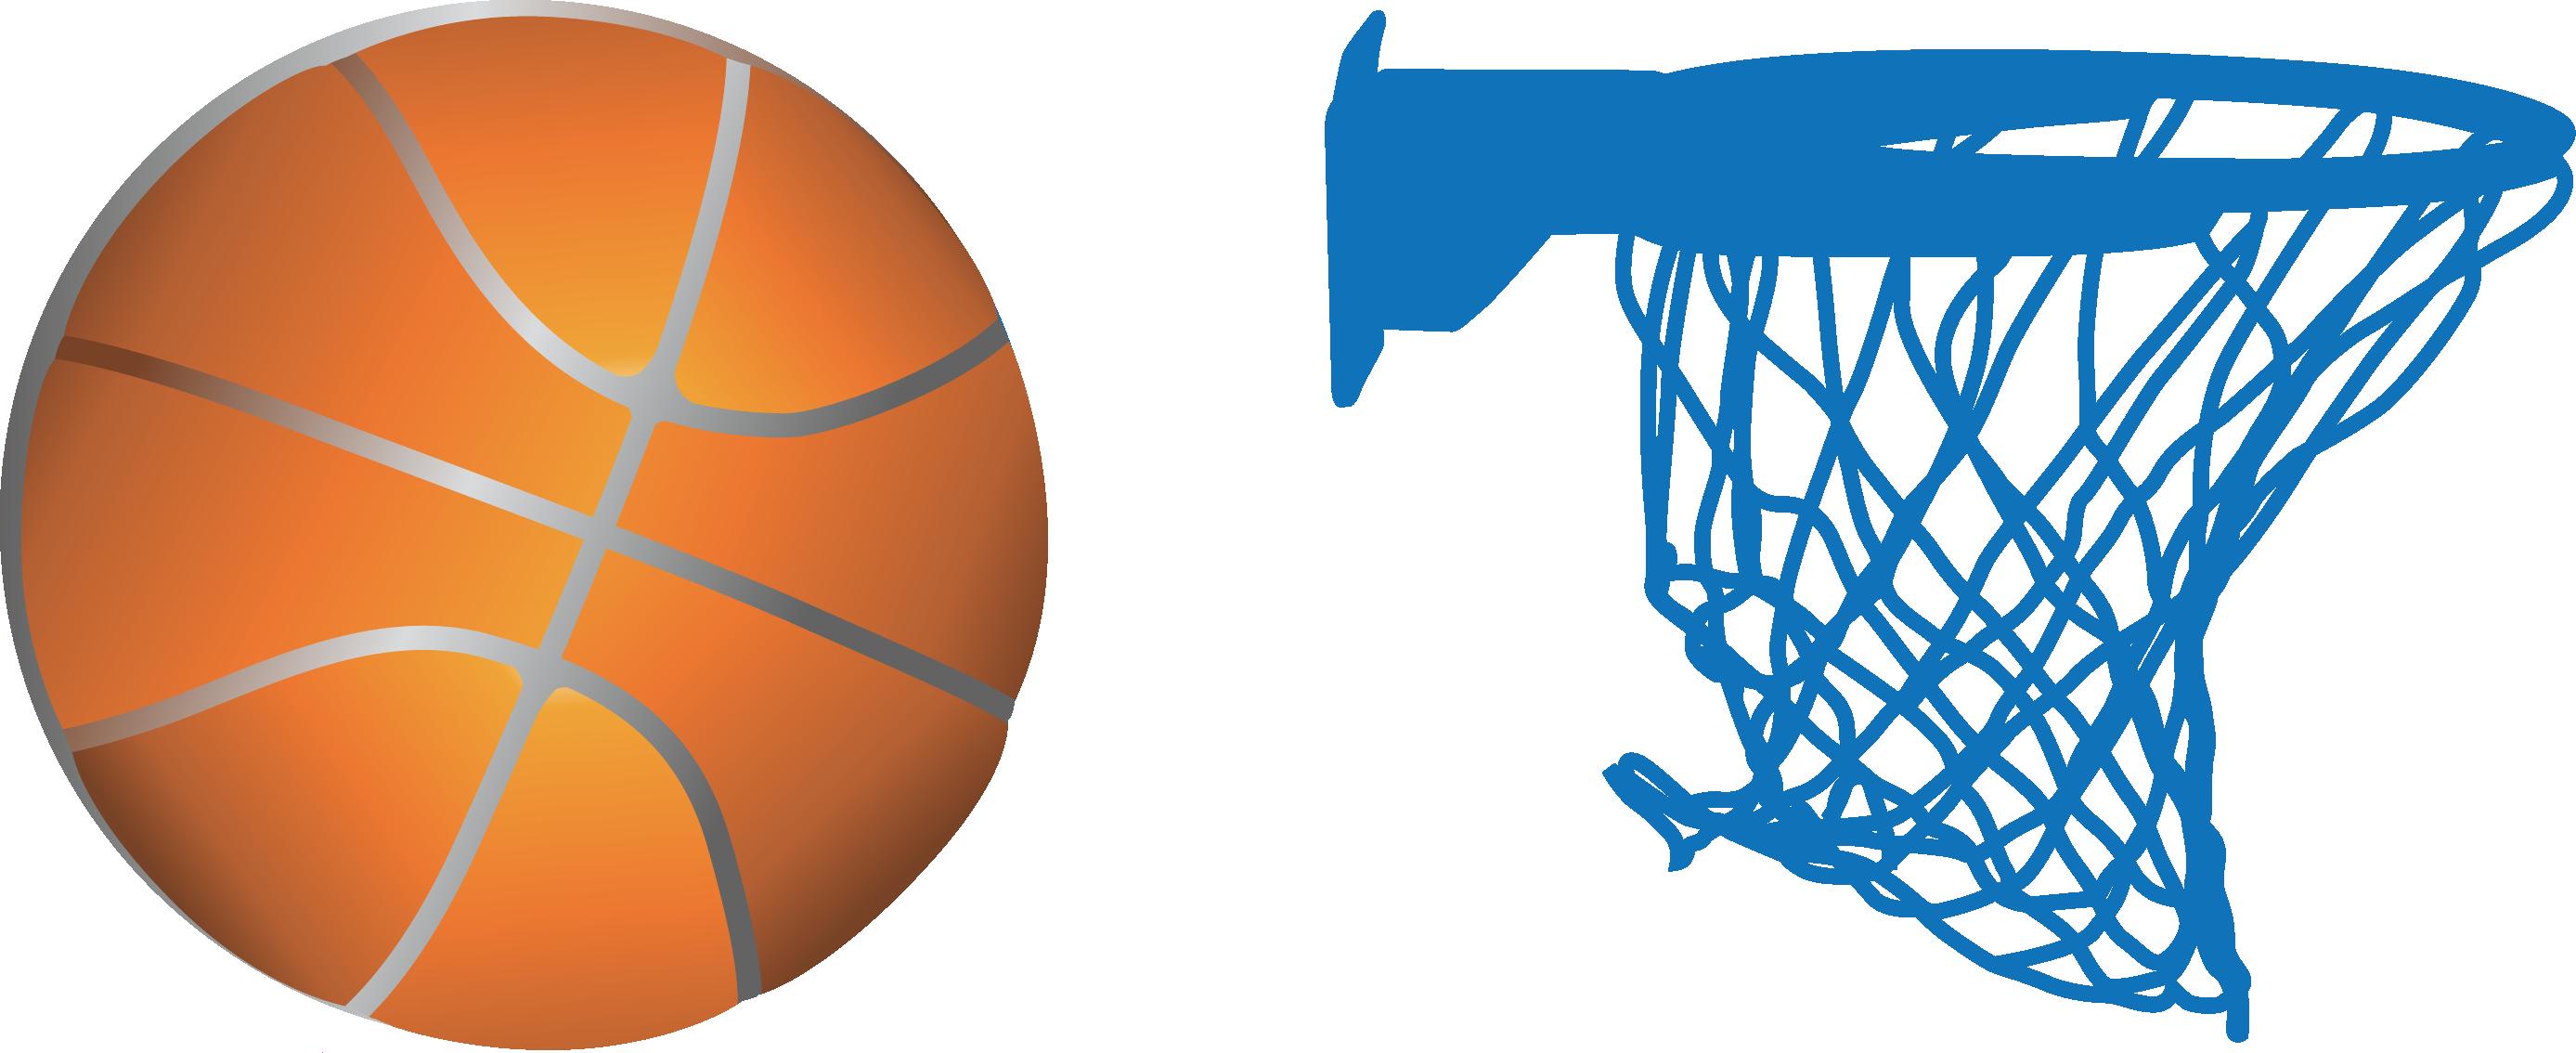 banner royalty free Basketball clip court. Sticker art transprent png